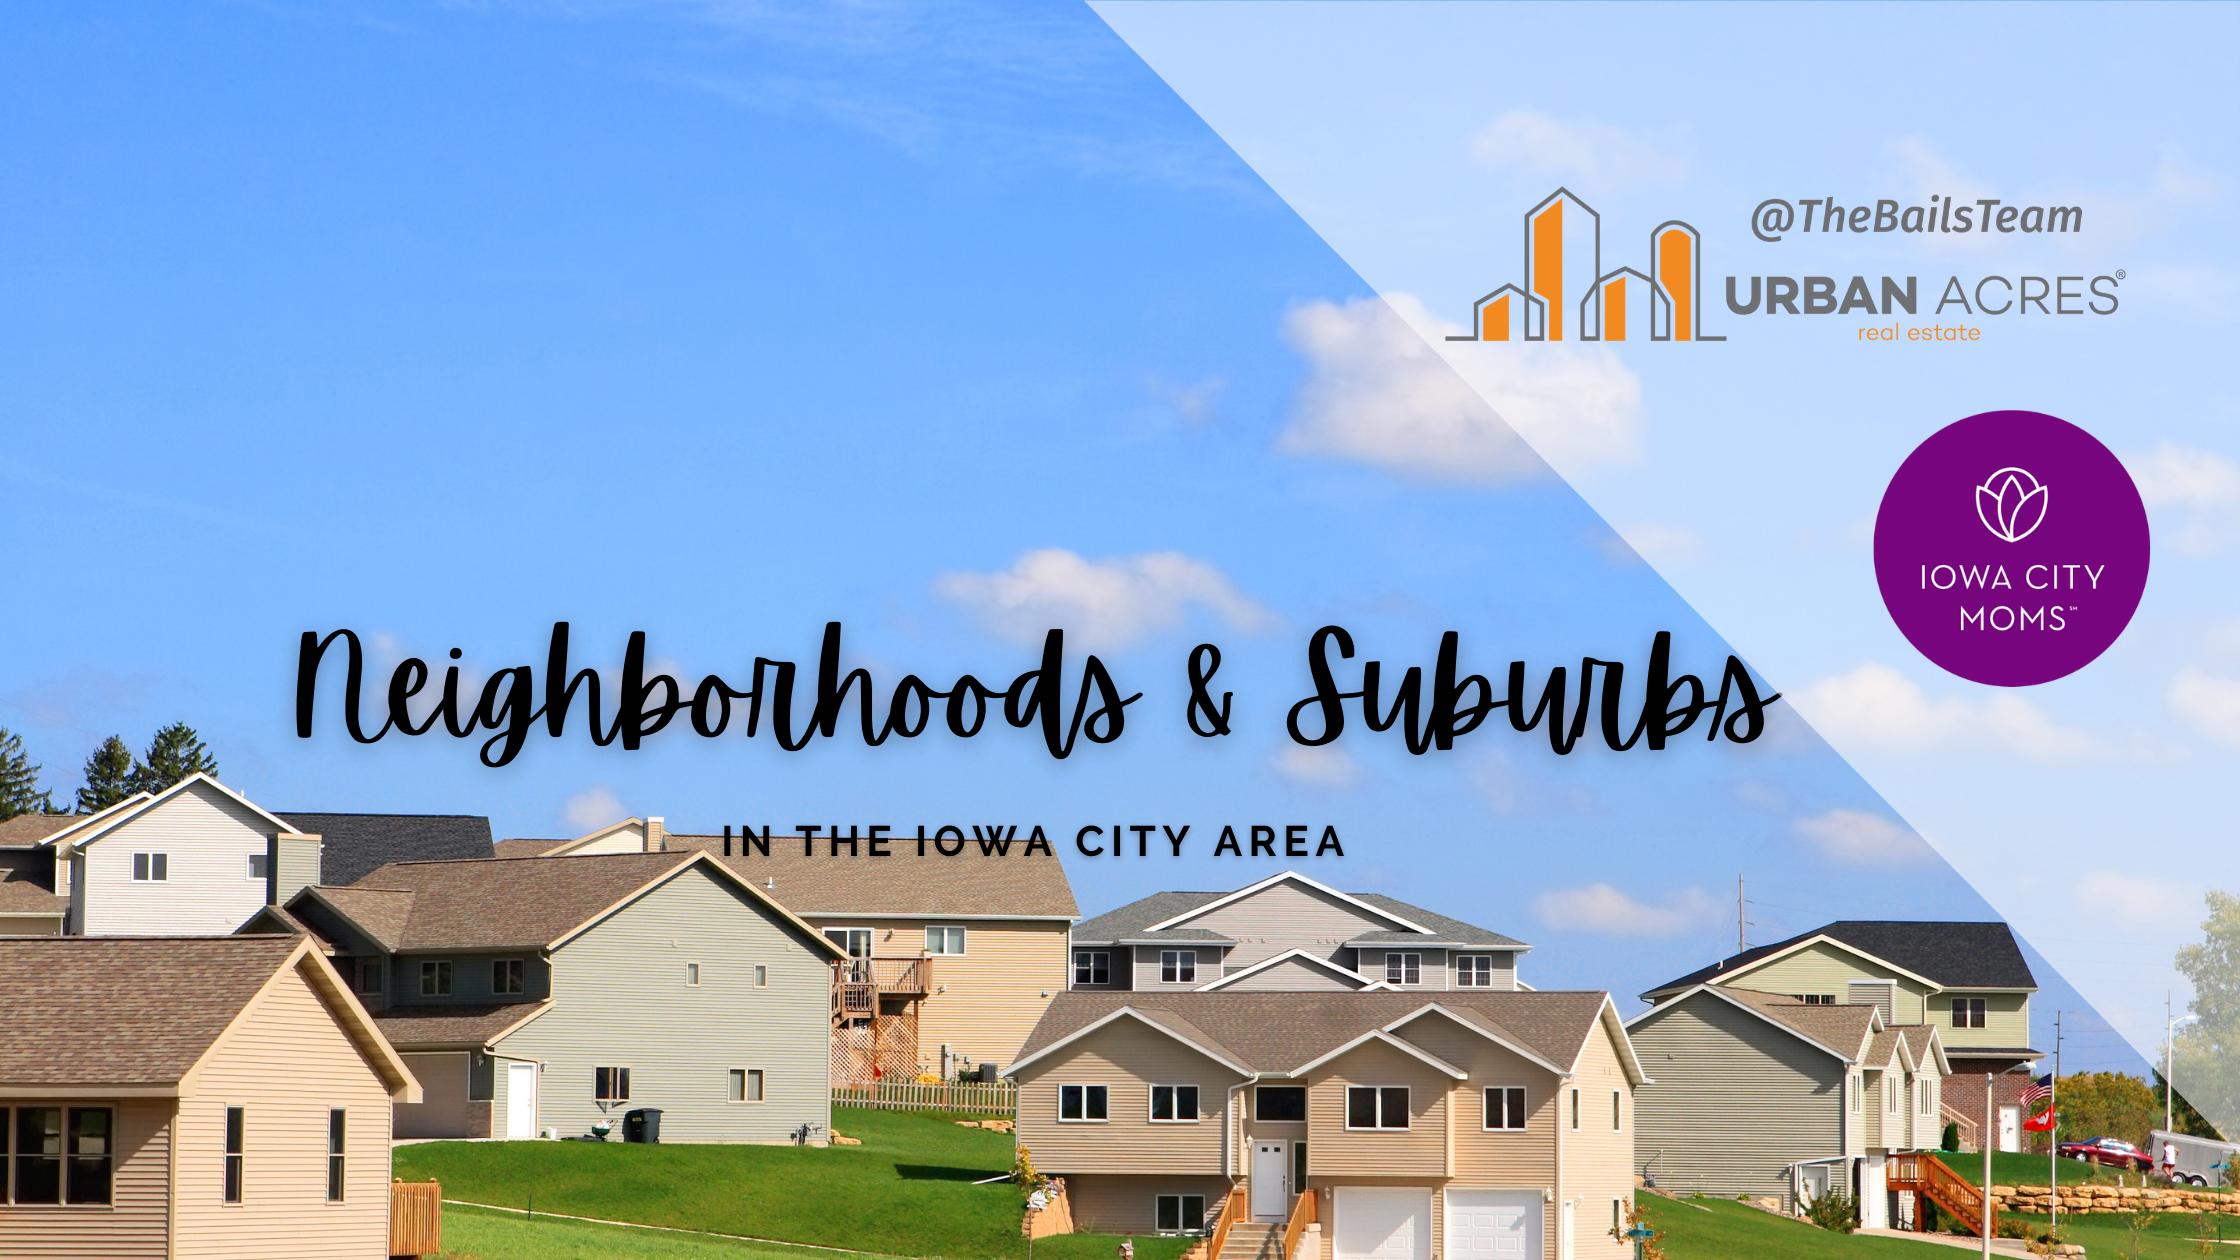 Iowa City Neighborhoods and Suburbs